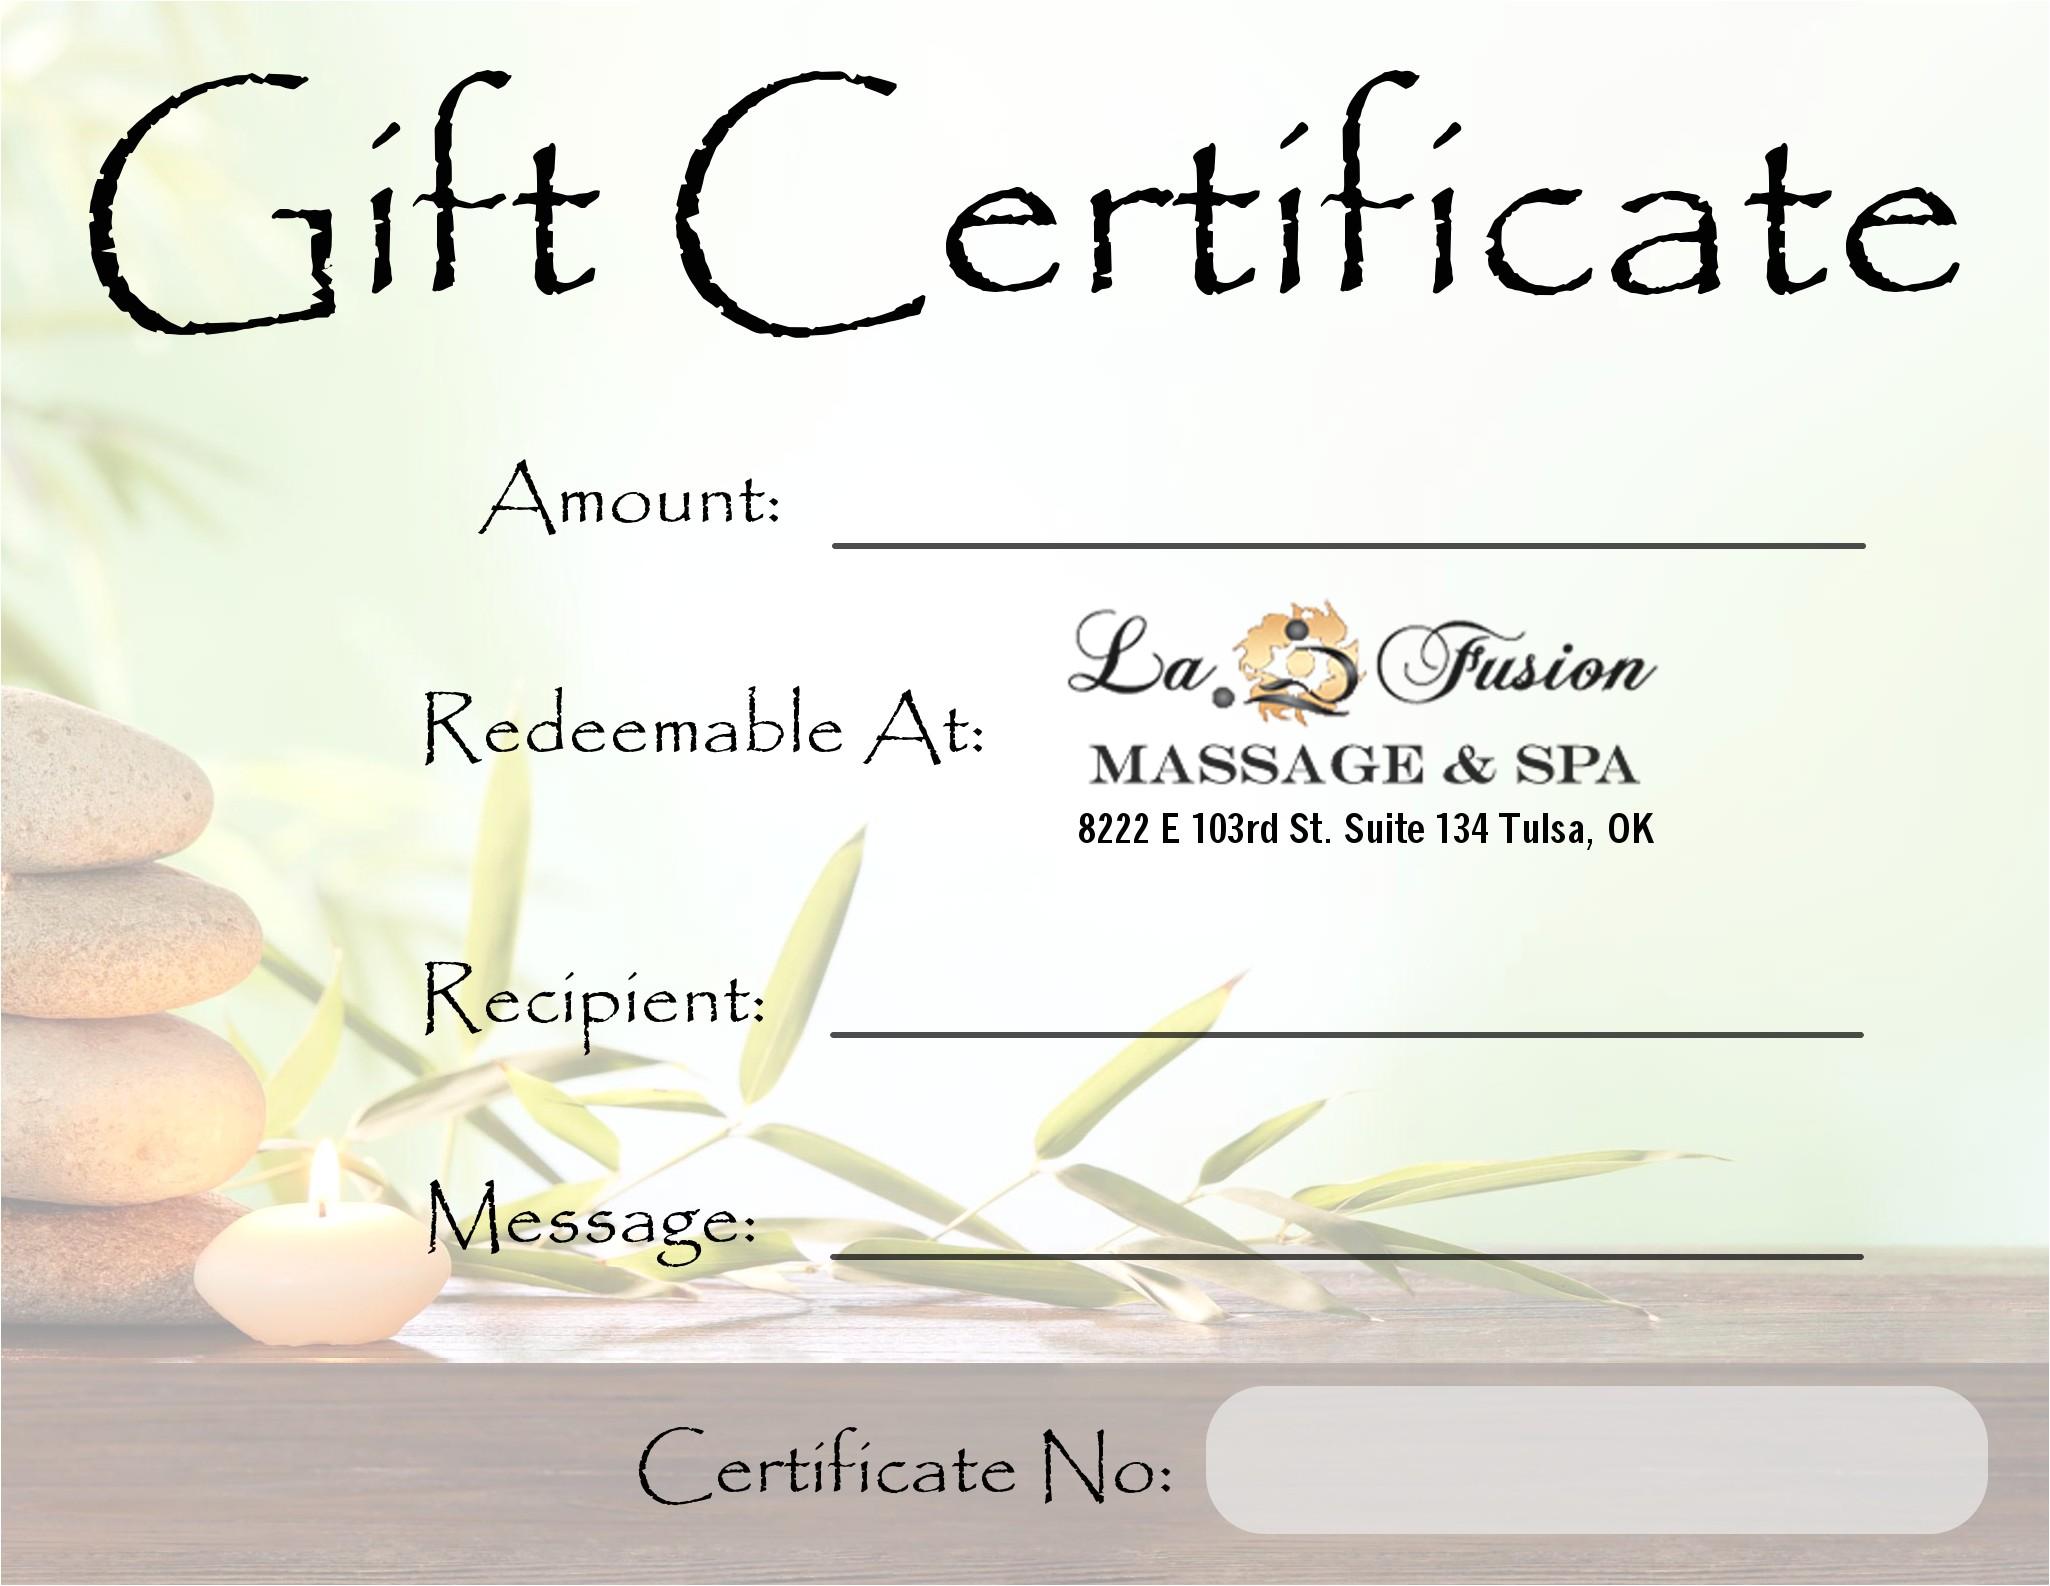 lafusion massage spa gift certificate